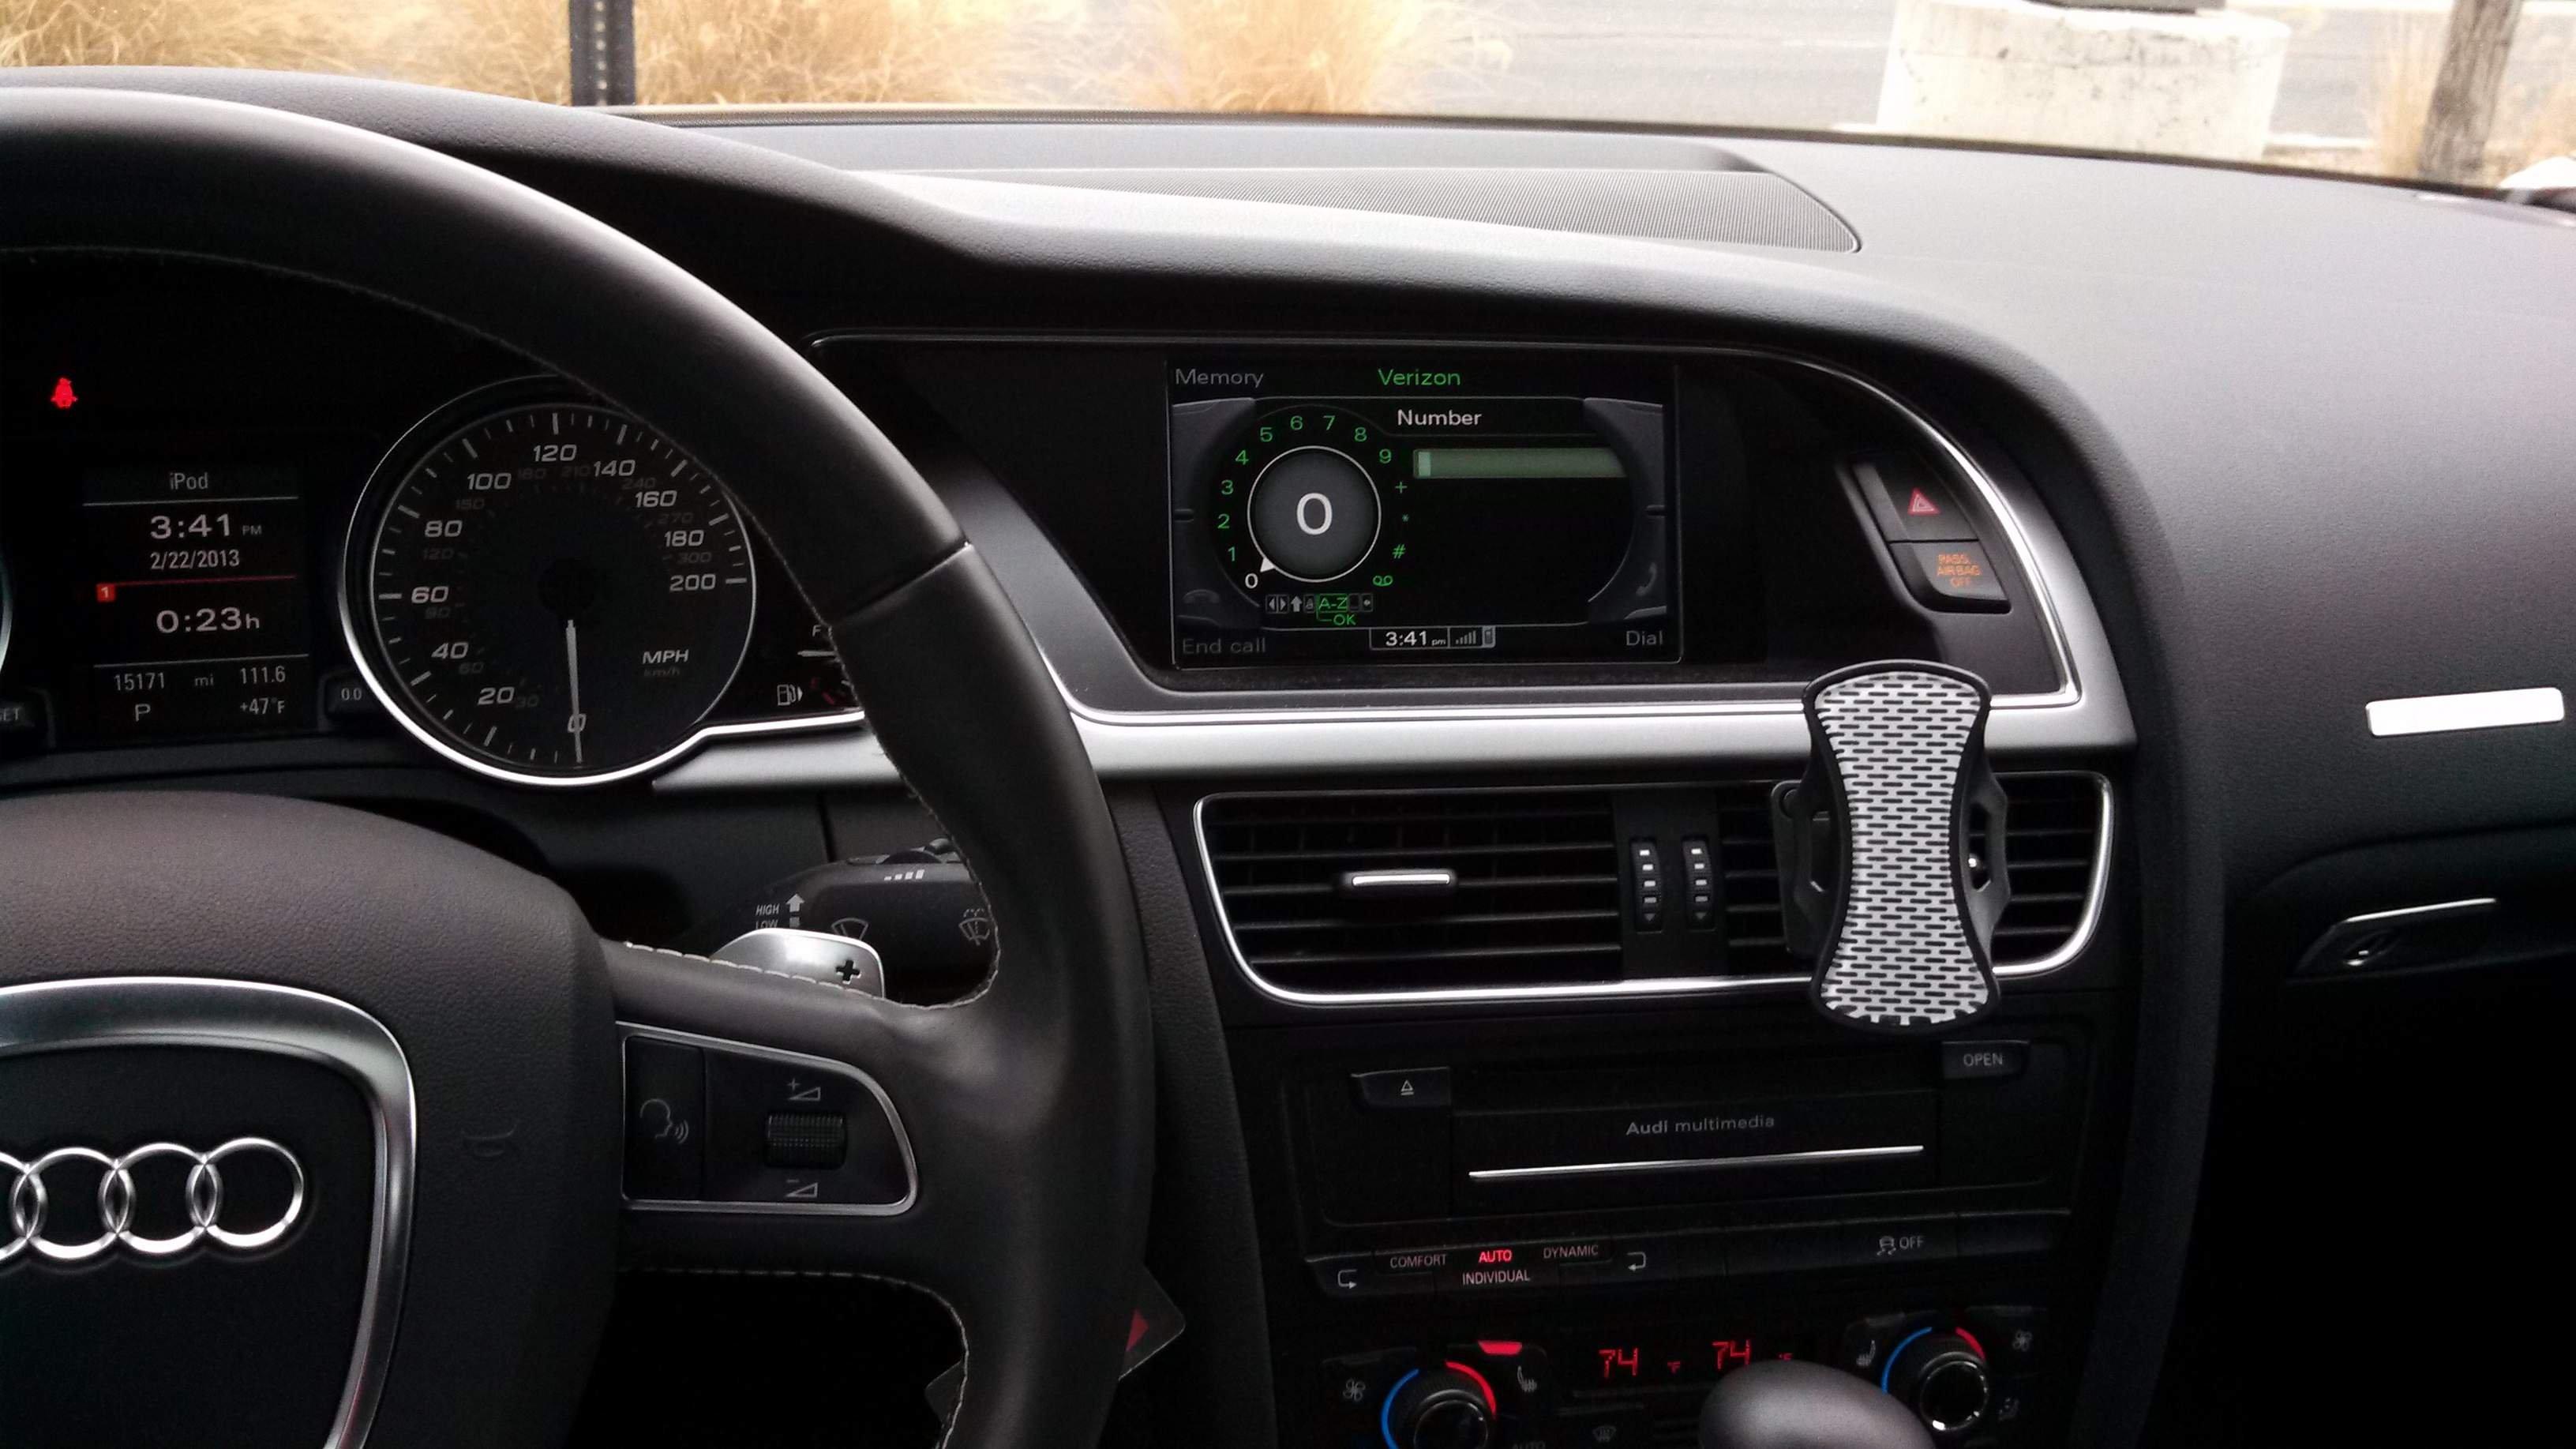 Show Us Your Phone Mount AMI Reroute Audi A Forum Audi S Forum - Audi iphone 6 car cradle